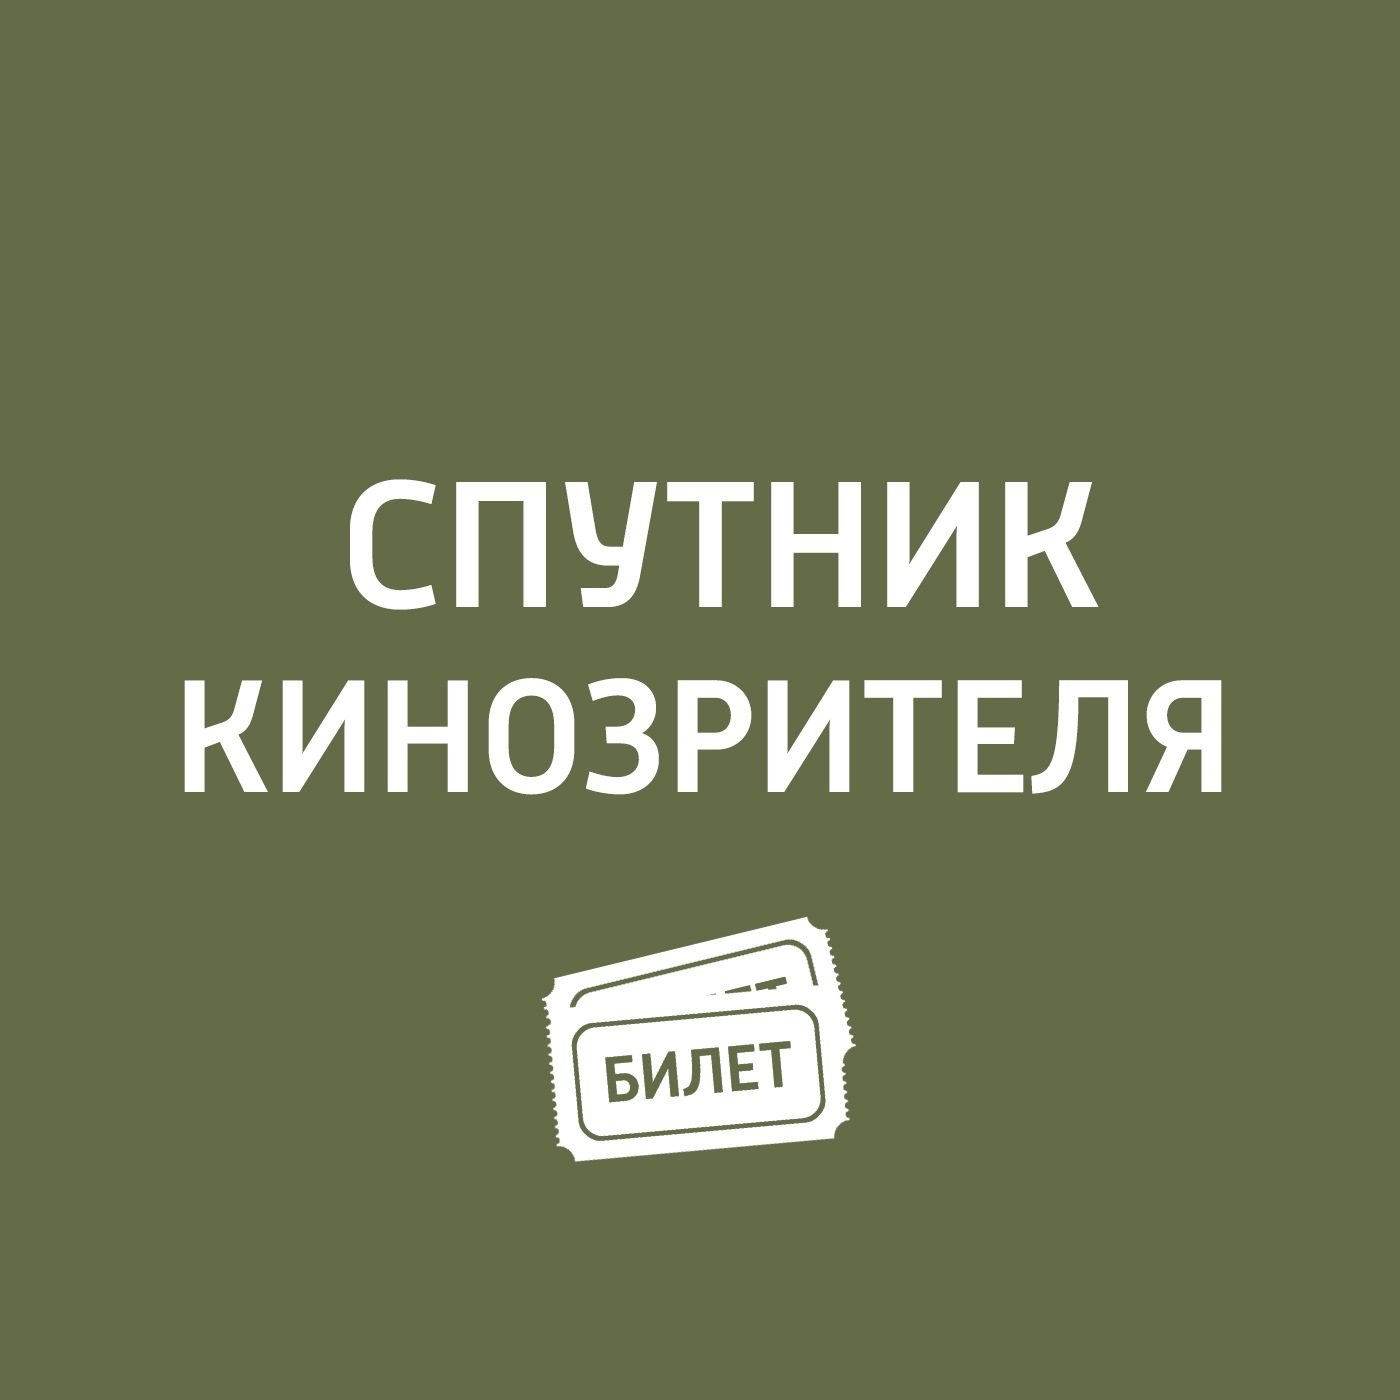 Антон Долин Новинки с 29 января 2015: «Охотник на лис